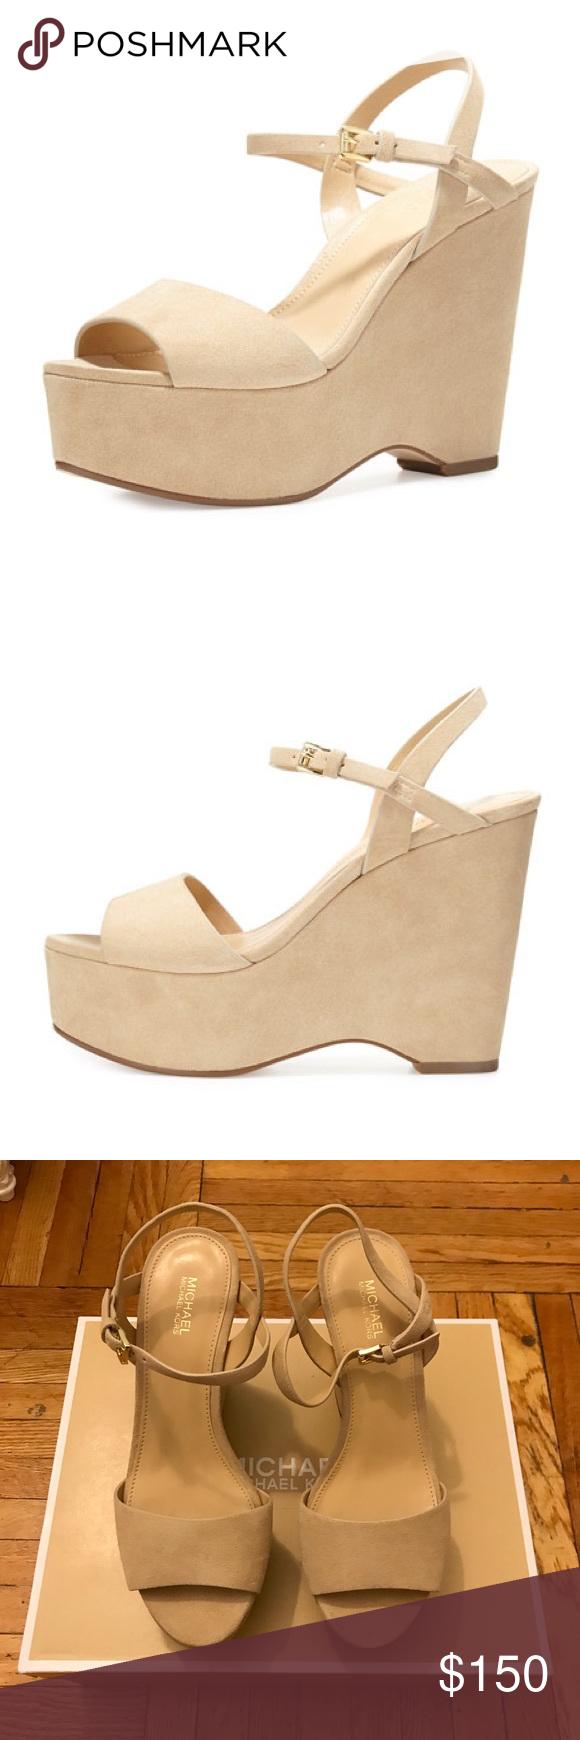 aedc2aa1b47 Michael Kors Leonora Suede Wedge Nude Bone wedge sandal brand new never  worn. Comes